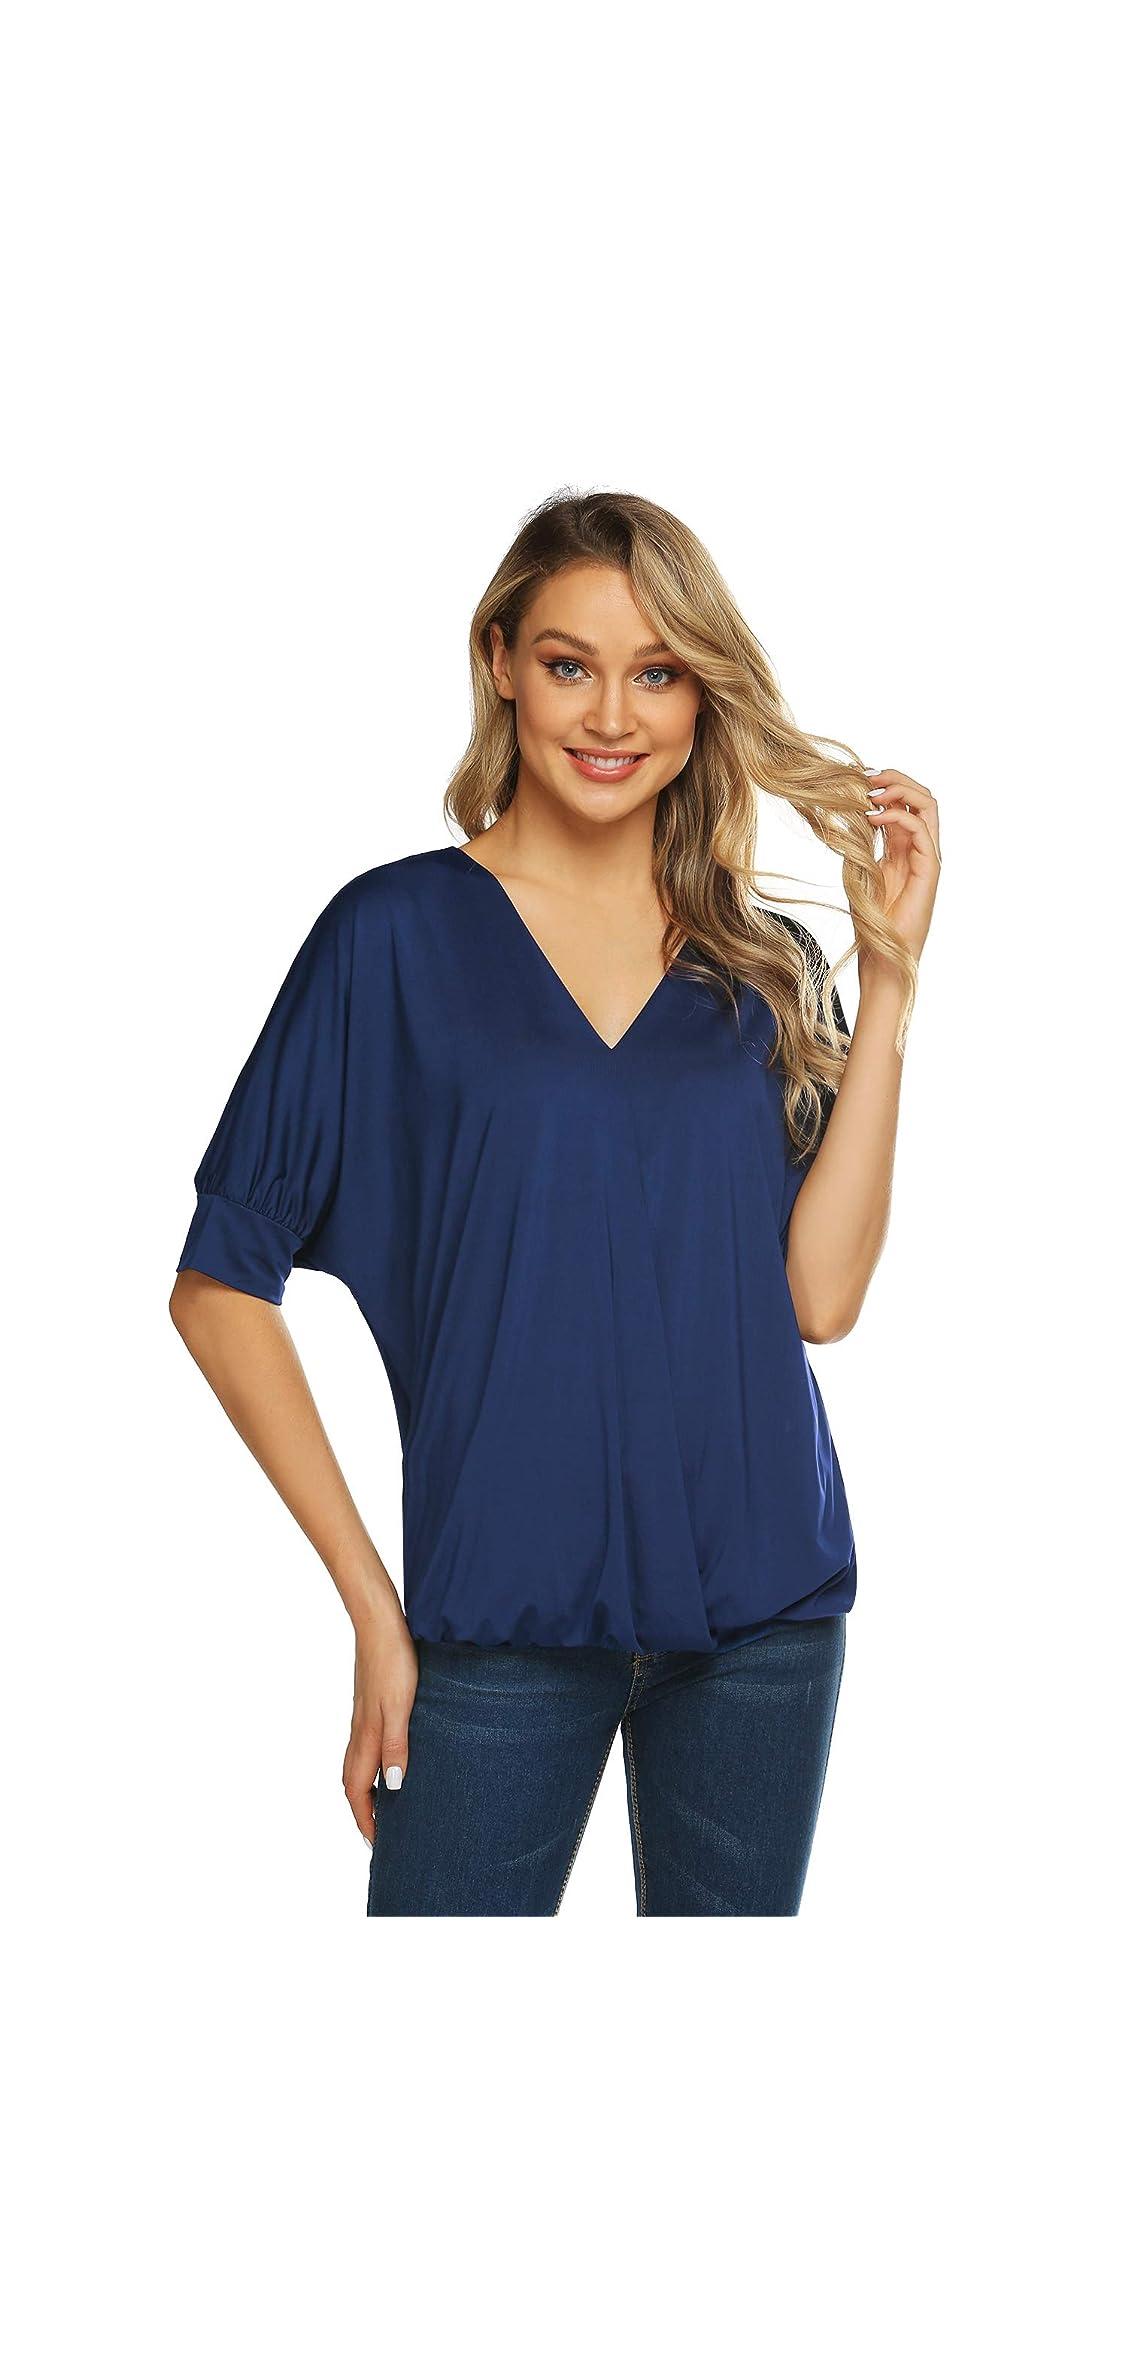 Women's Dolman Top Wrap Front Side Shirring Blouse Top